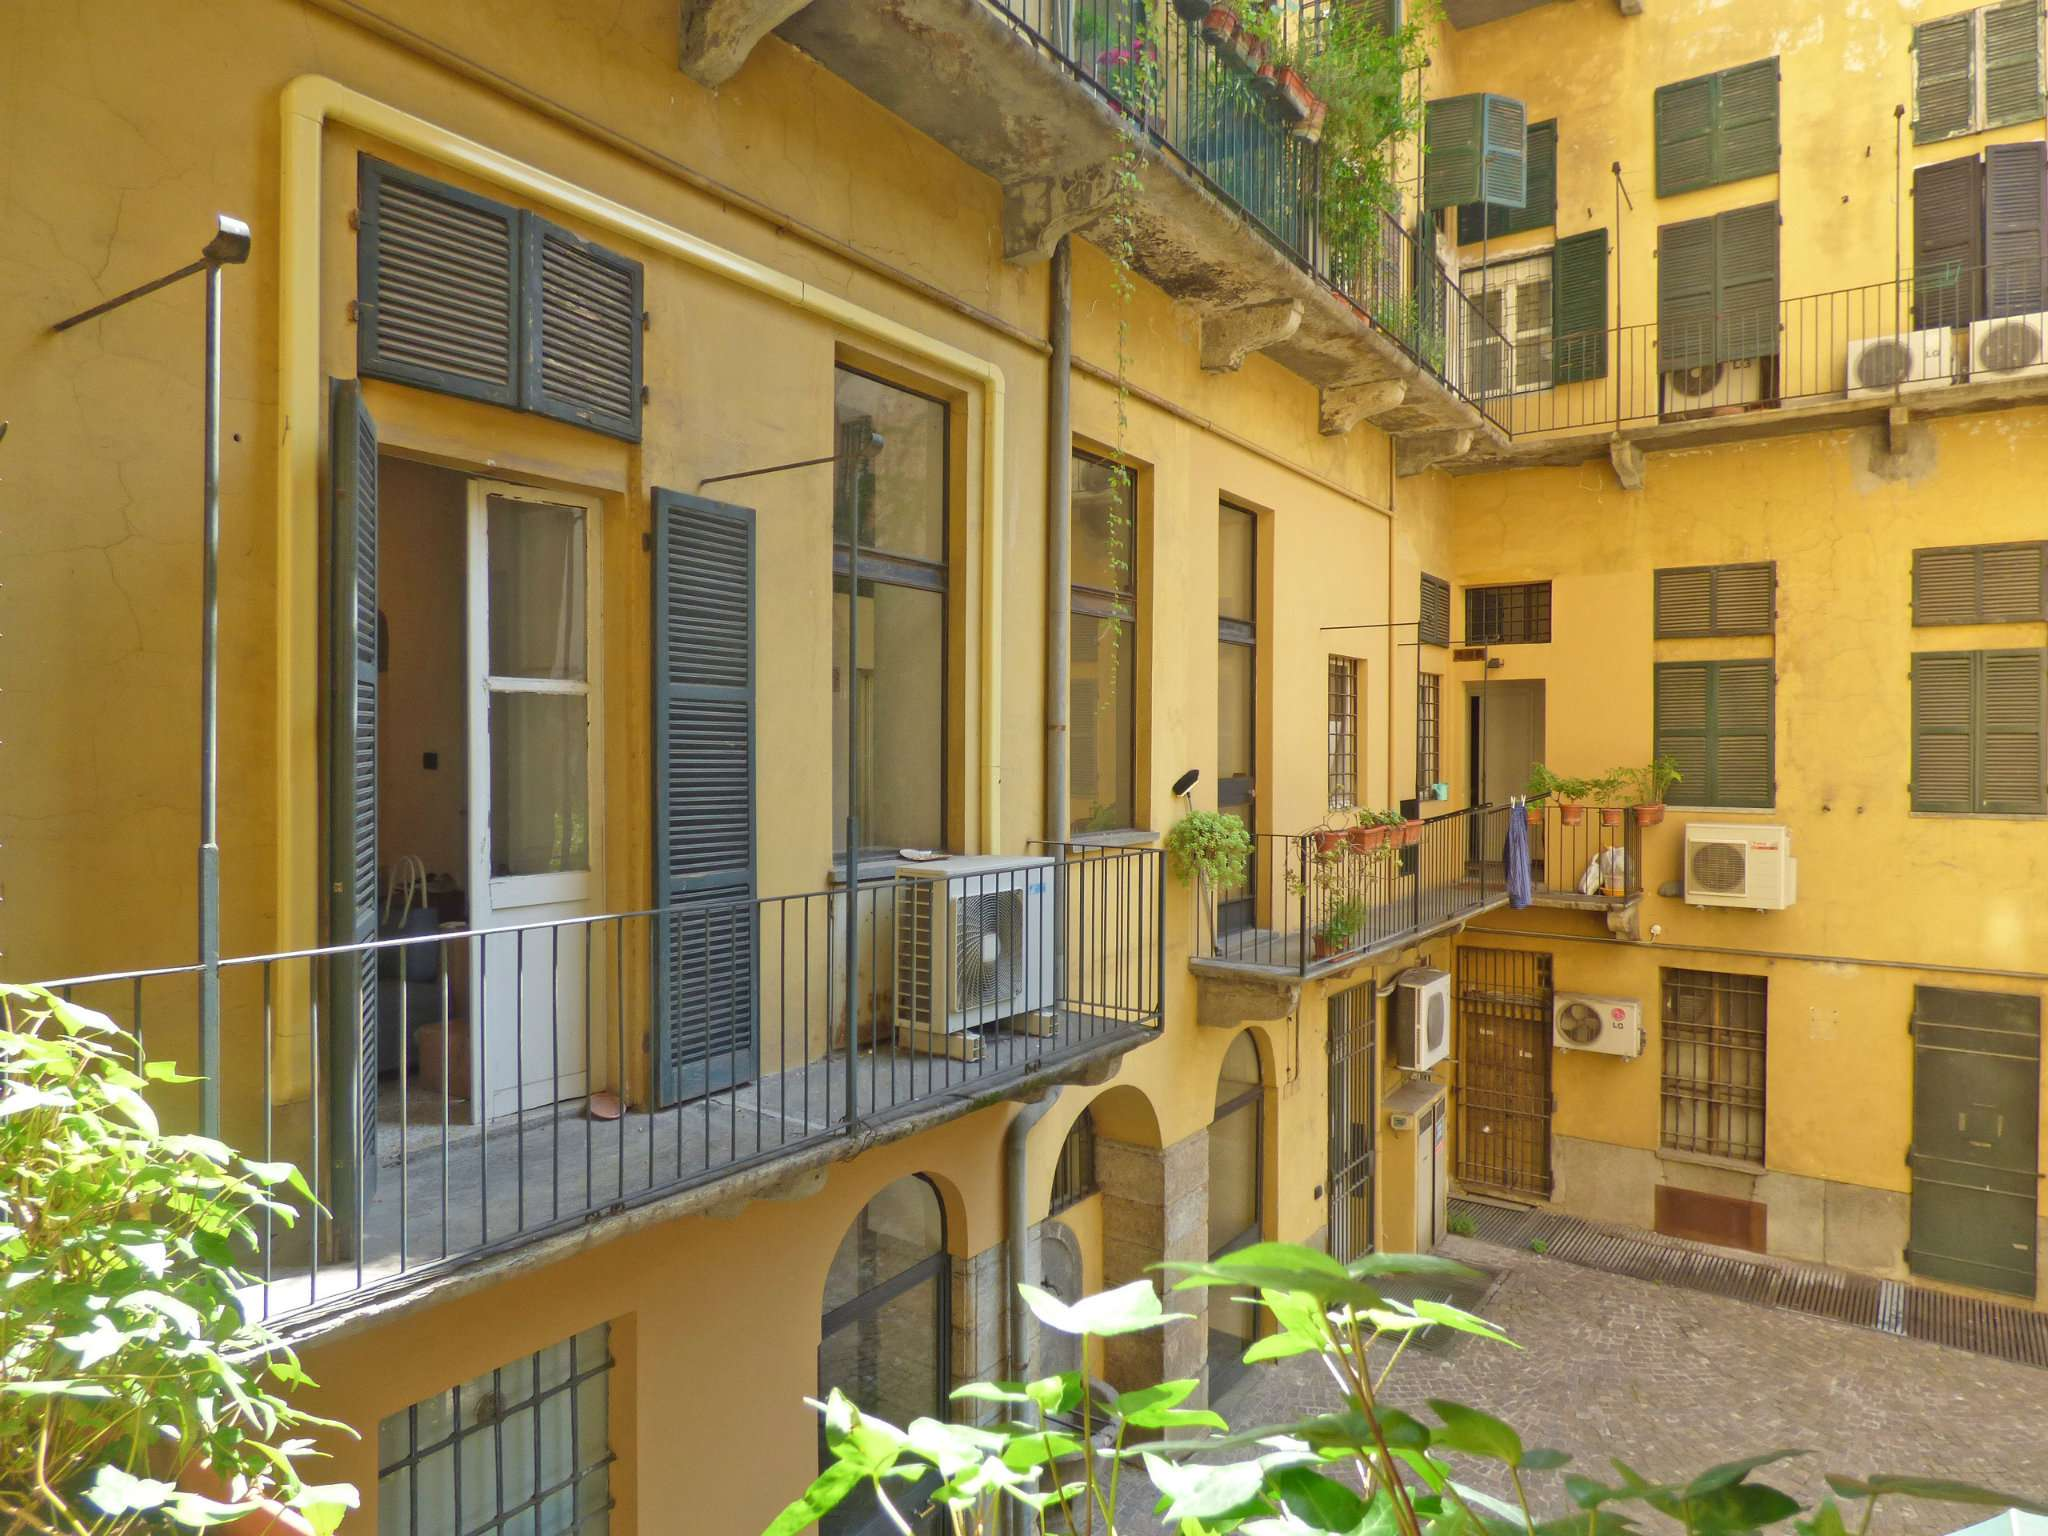 Bilocale Torino Via Garibaldi 11